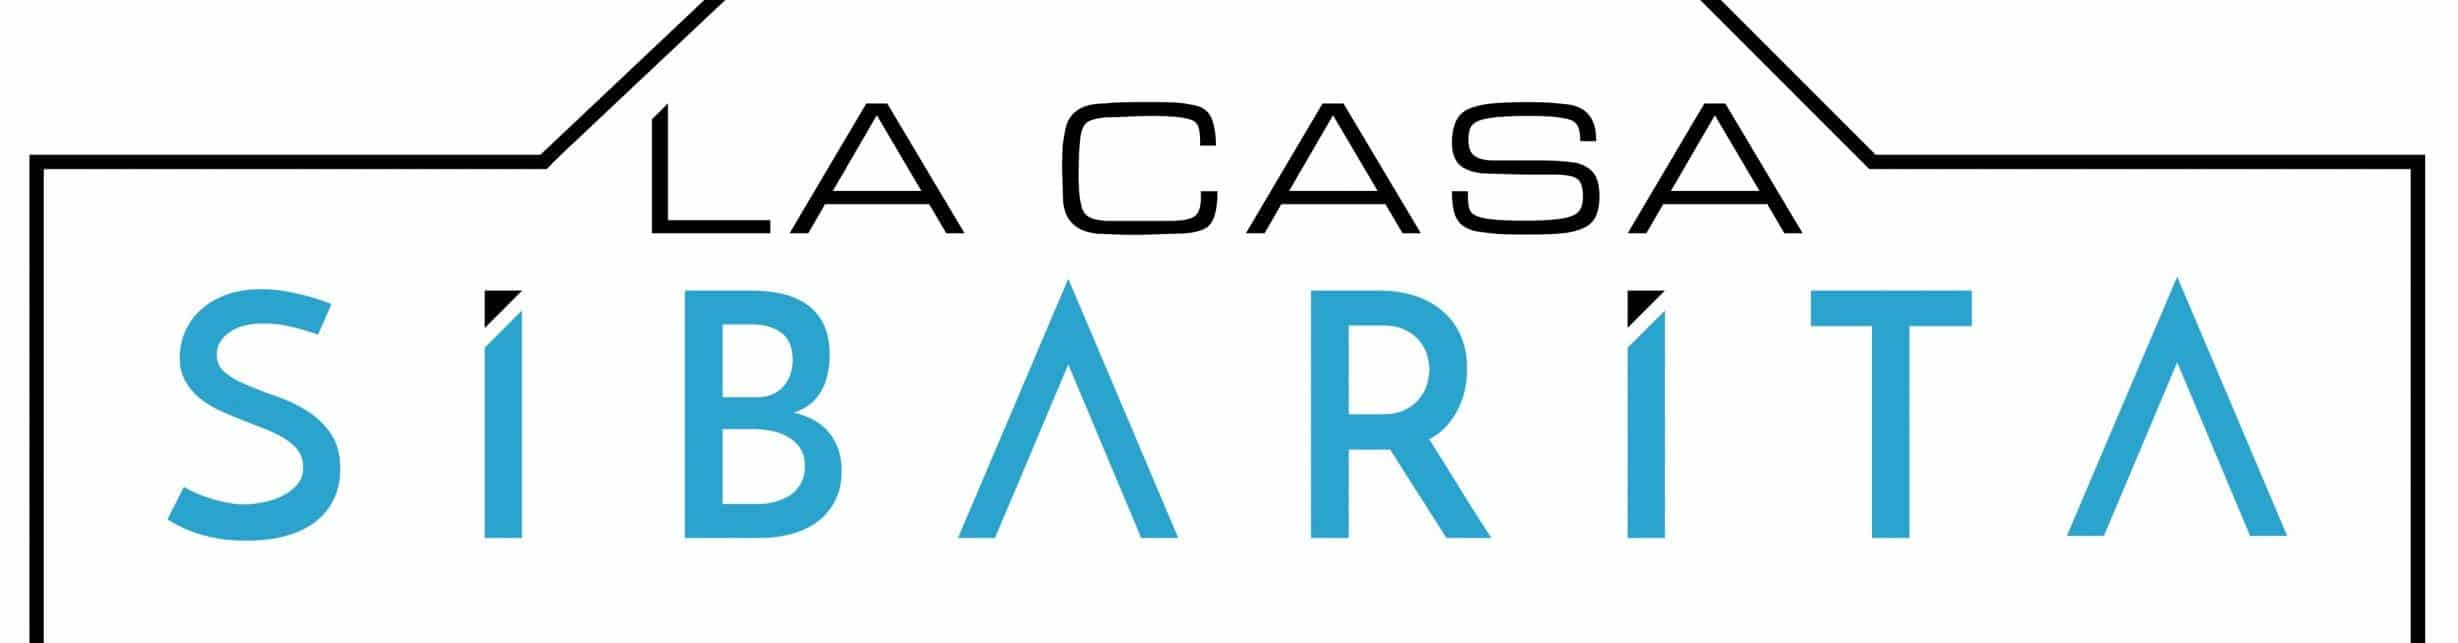 LaCasaSibarita